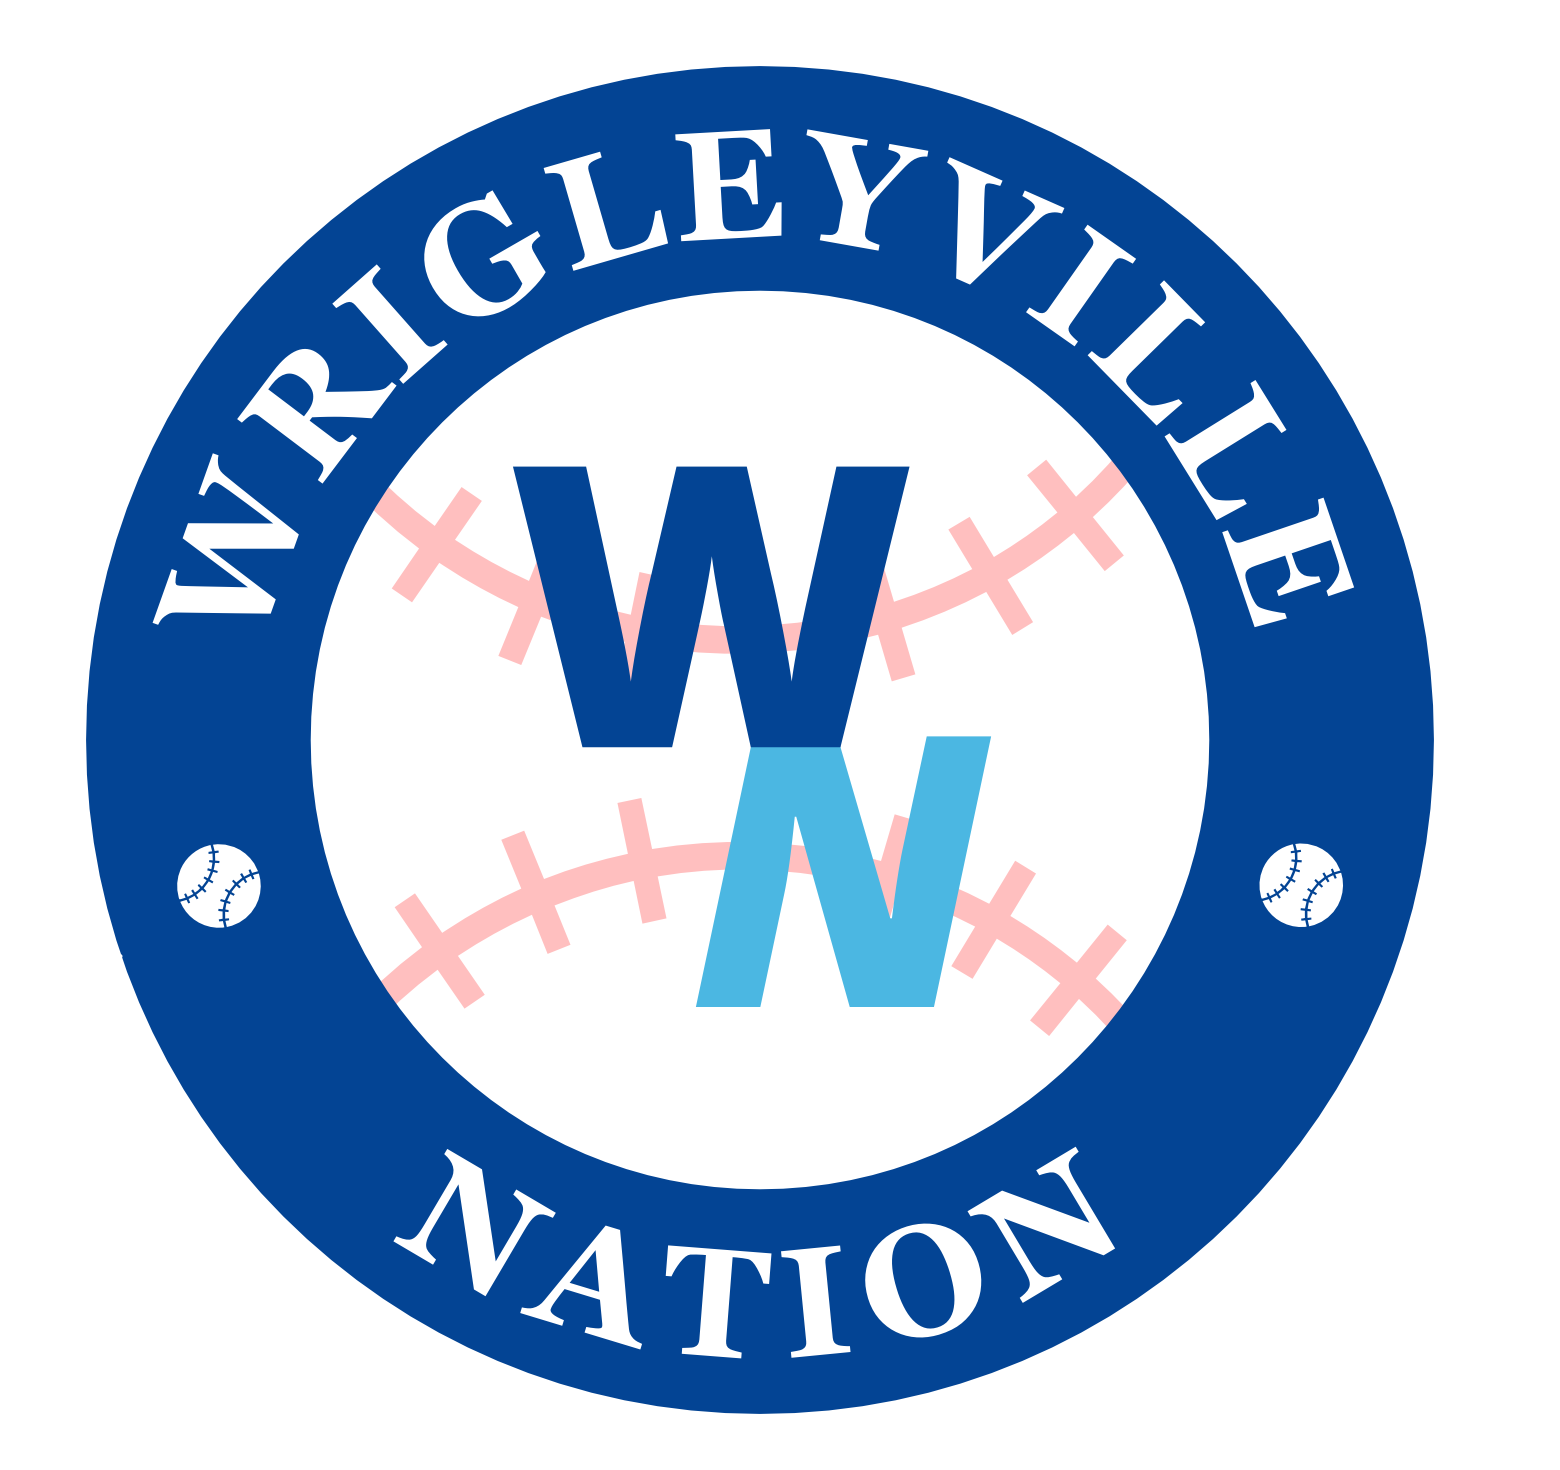 Wrigleyville Nation Ep 262 - Guest: Ryan Davis, Arrieta Gone, Cubs Keep Losing, & More show art